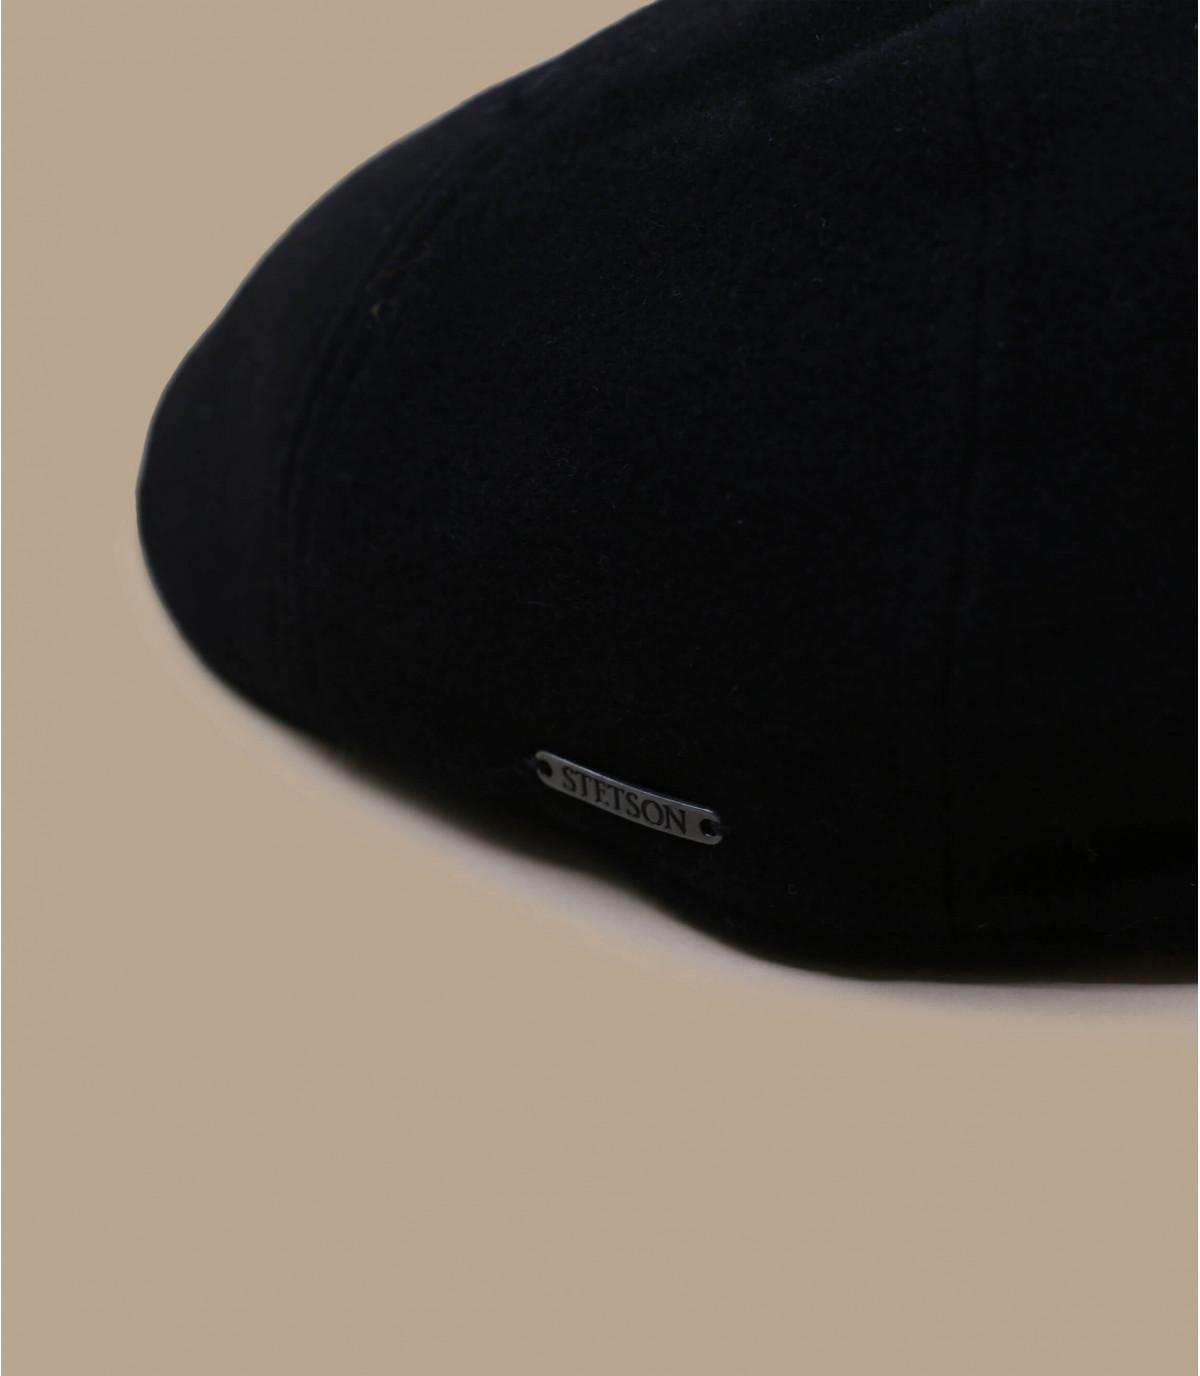 Detalles Texas wool cashmere black imagen 2